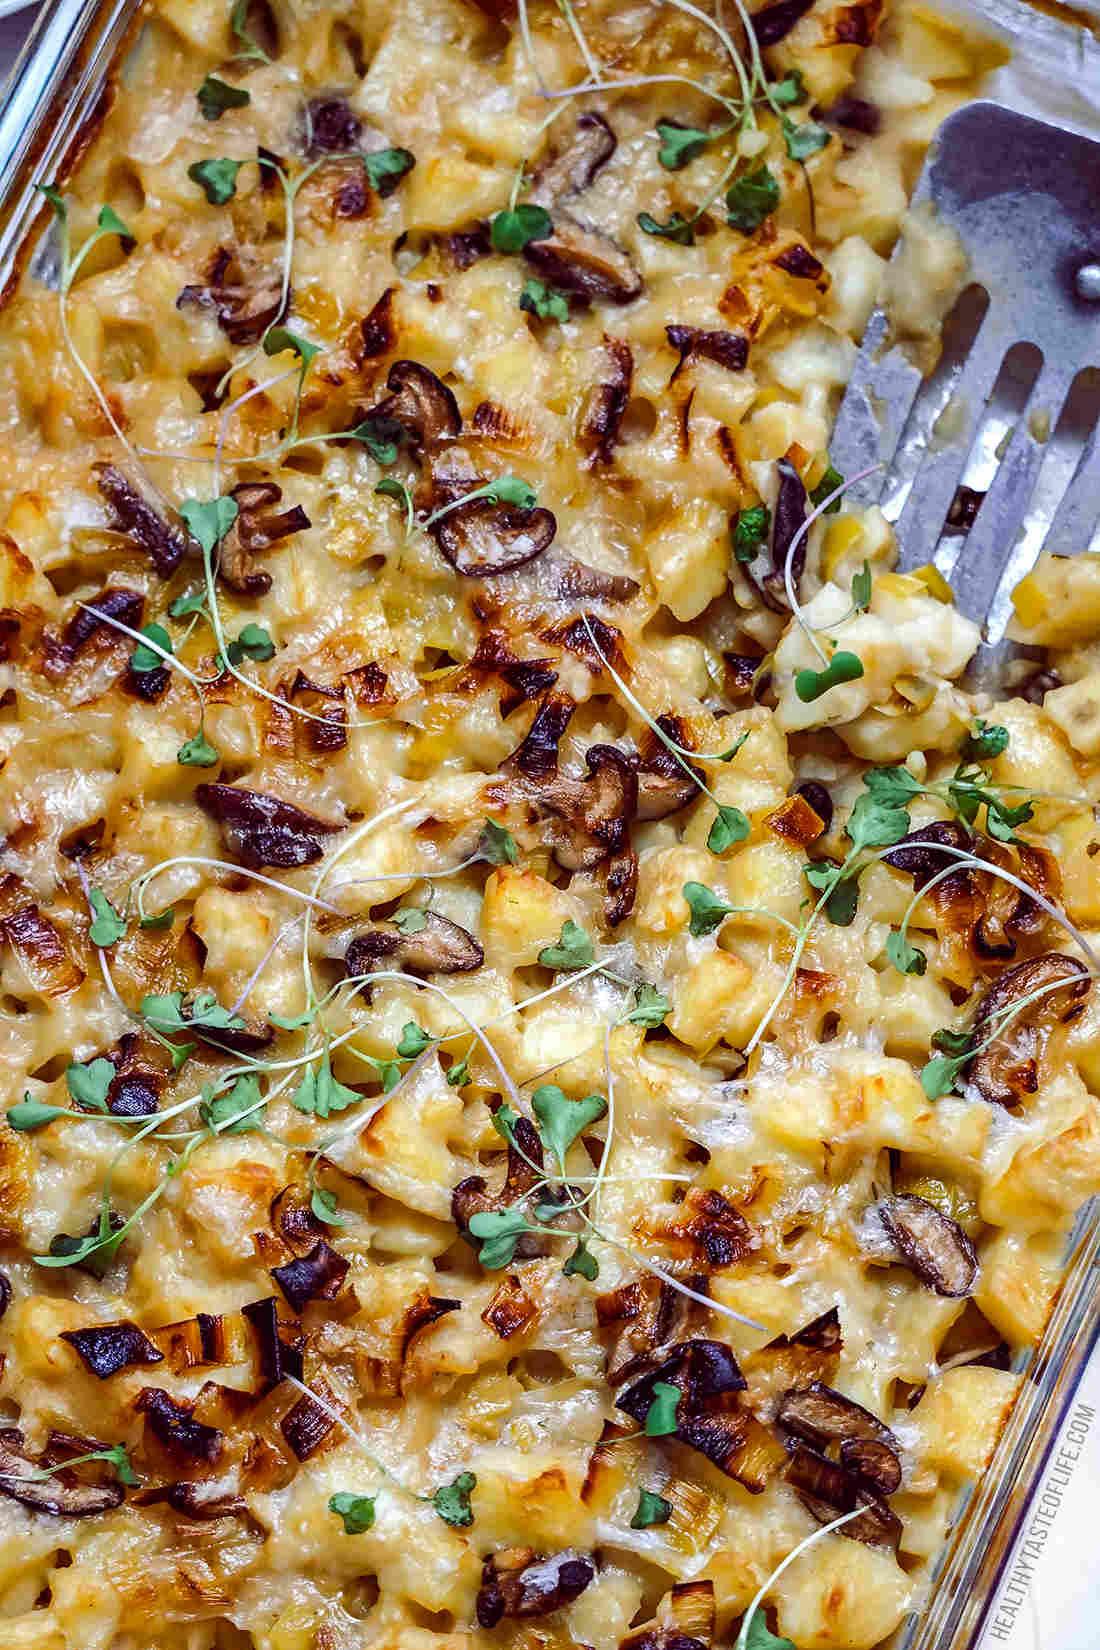 Vegan potato bake, vegan potato recipes in a casserole (gluten free)